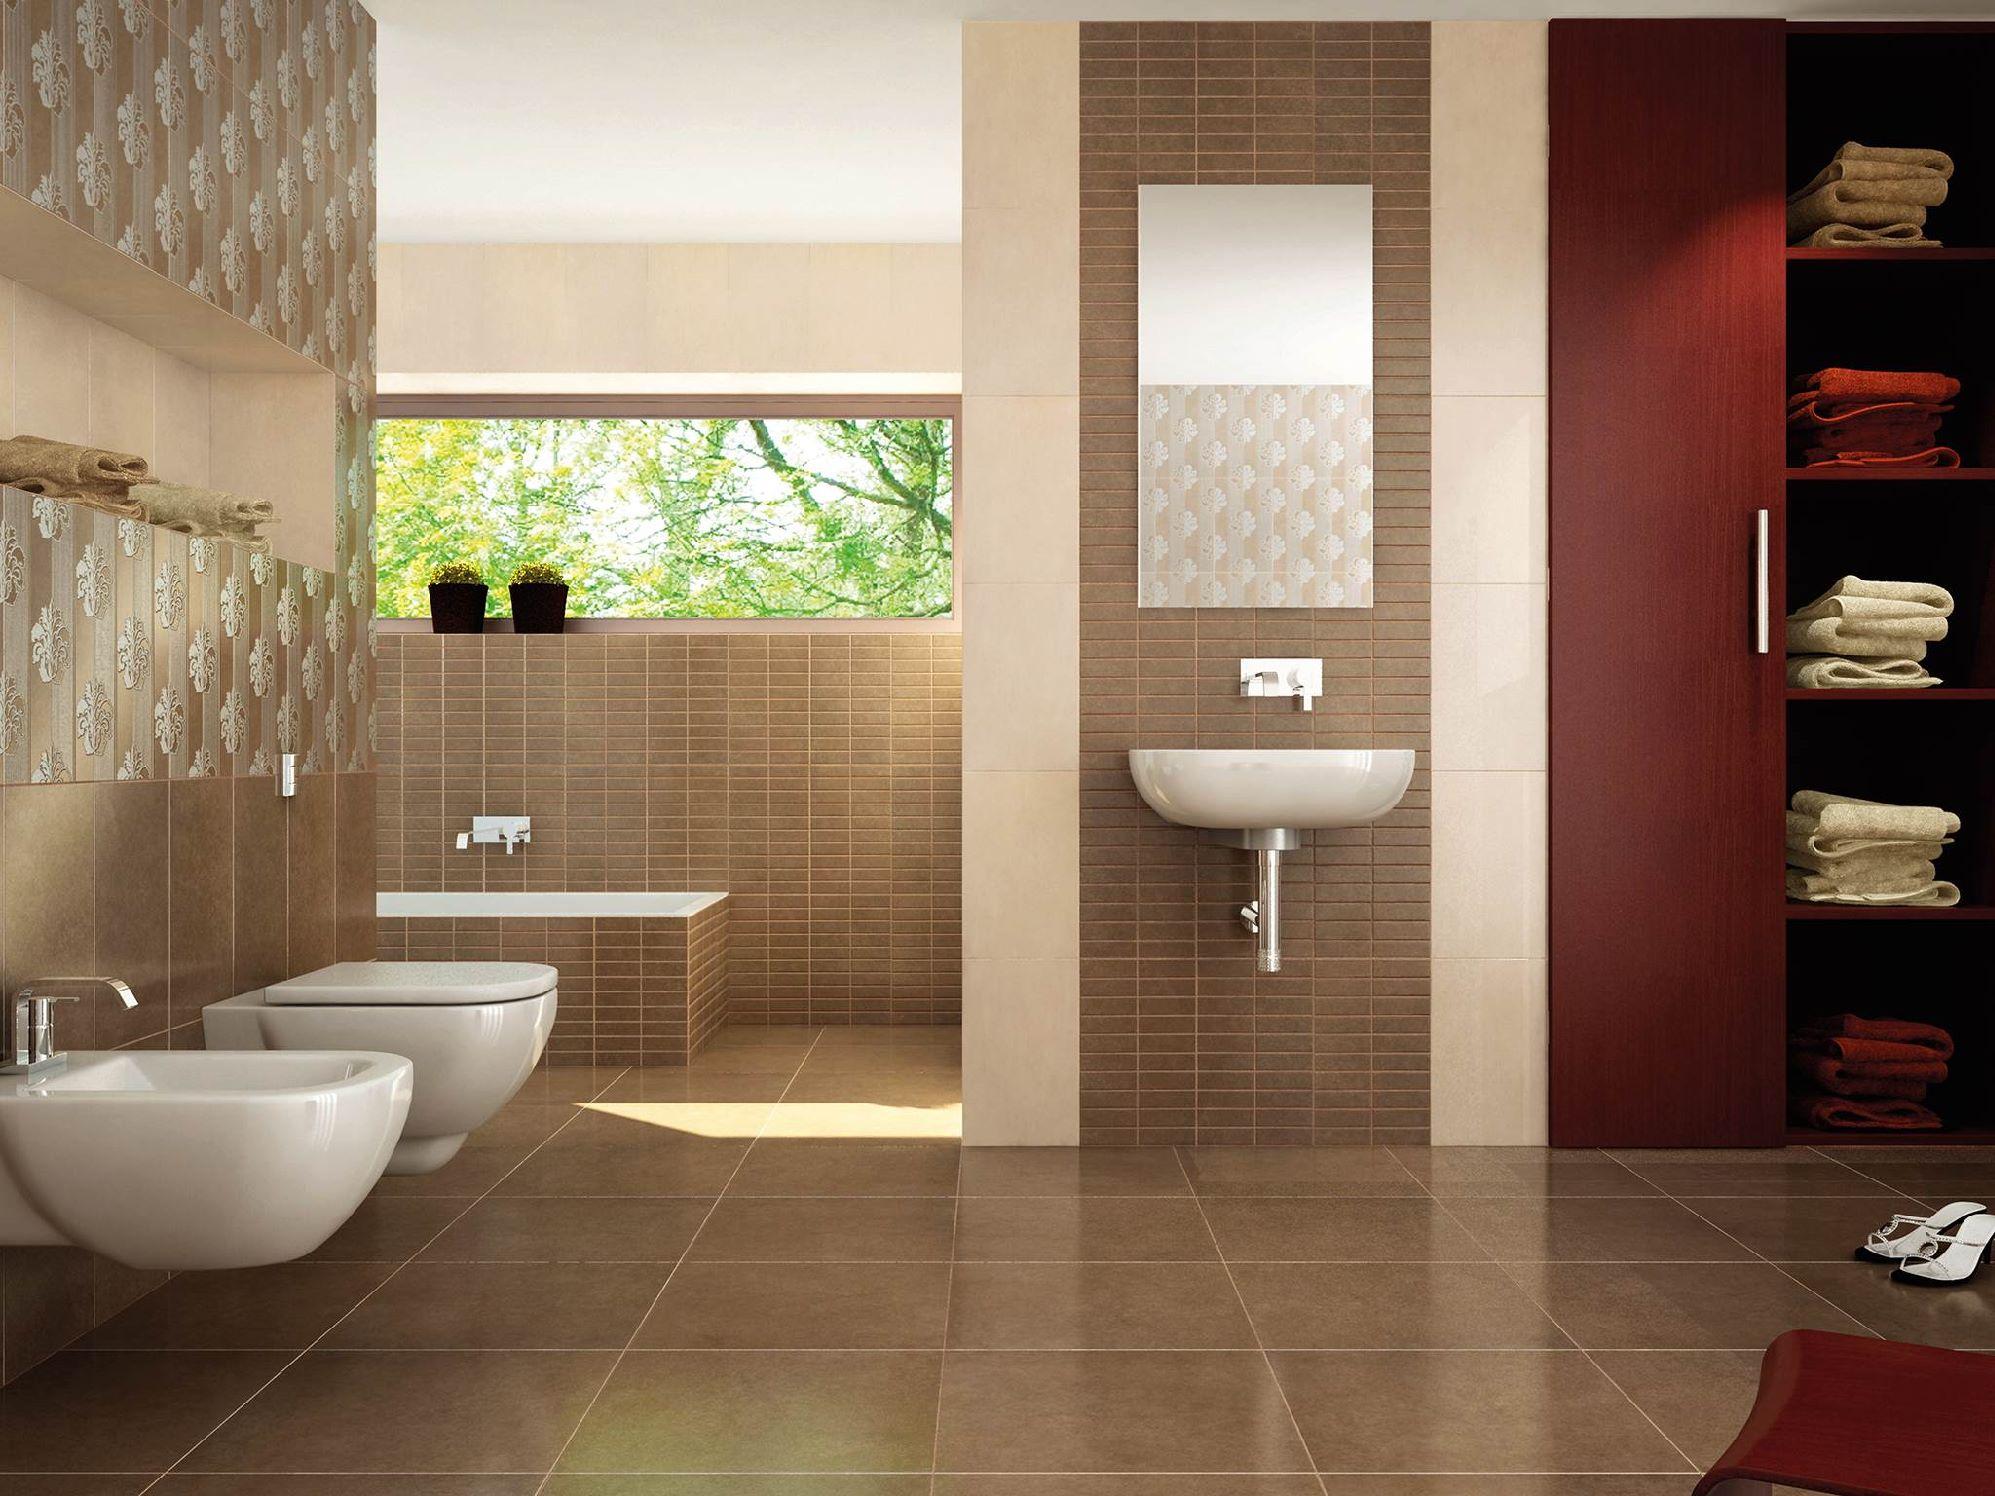 Faience salle de bain cifre serie boston 25x40 1 choix - Faience salle de bain discount ...